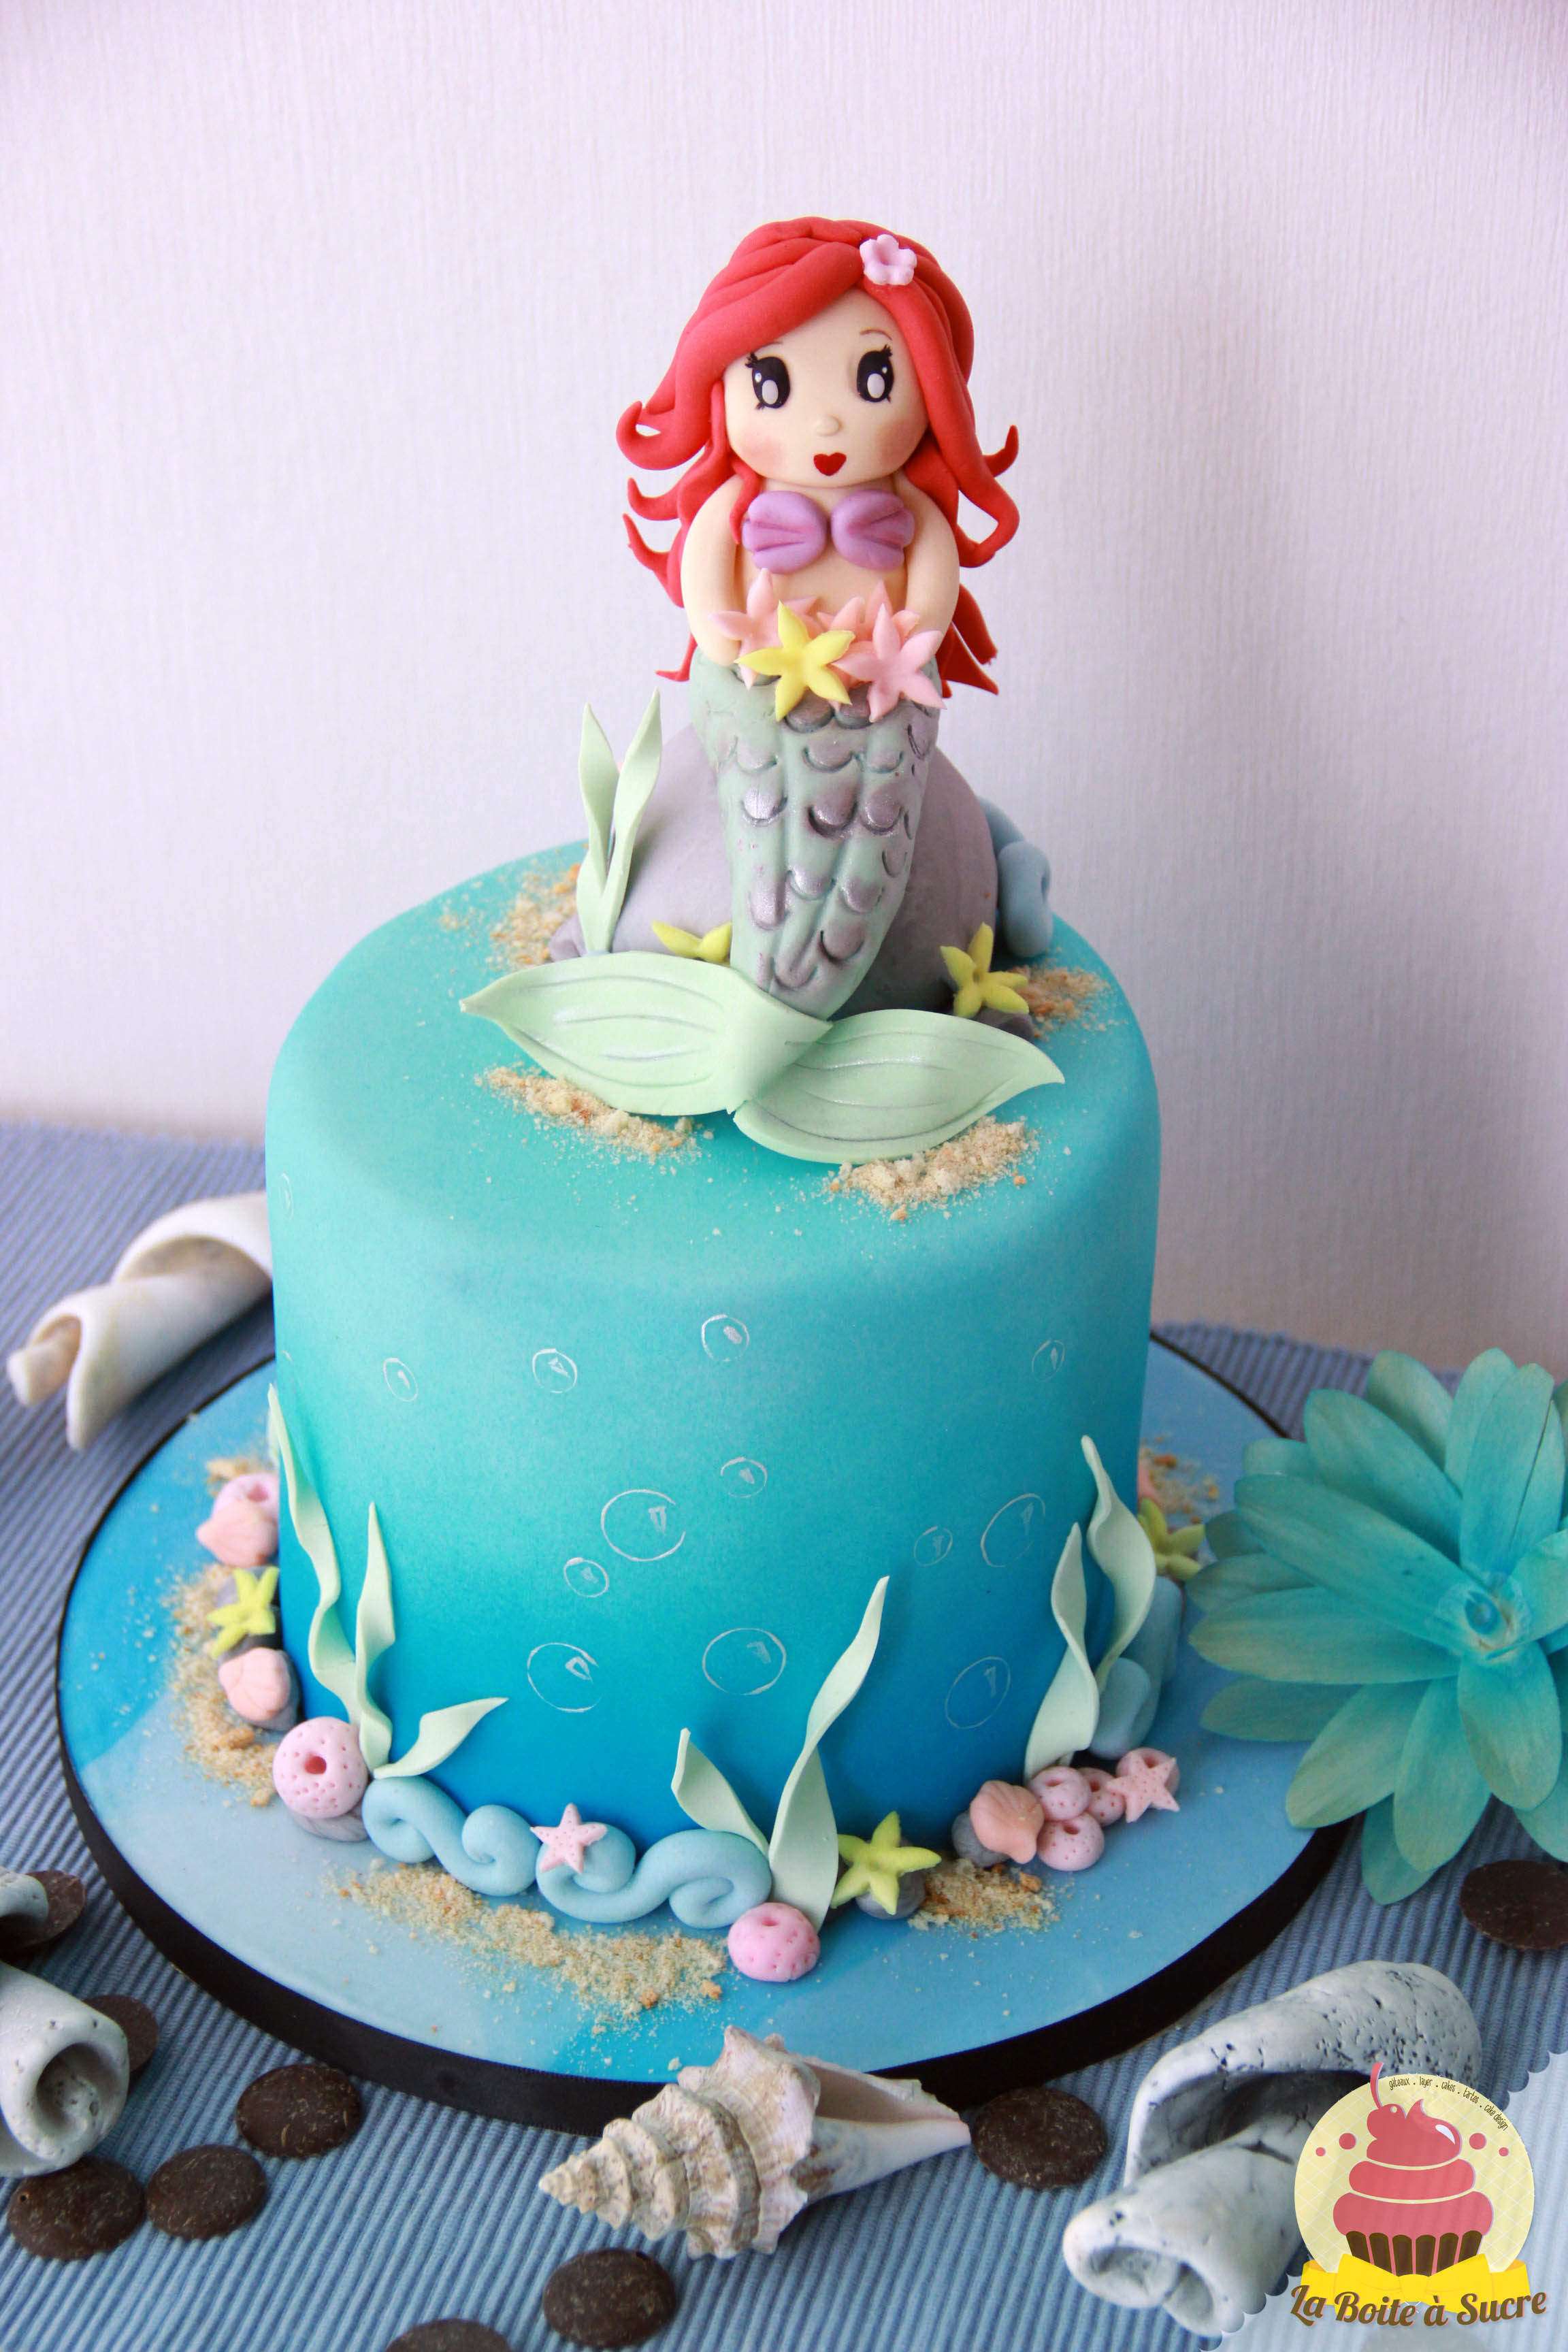 Little Mermaid themed birthday cake